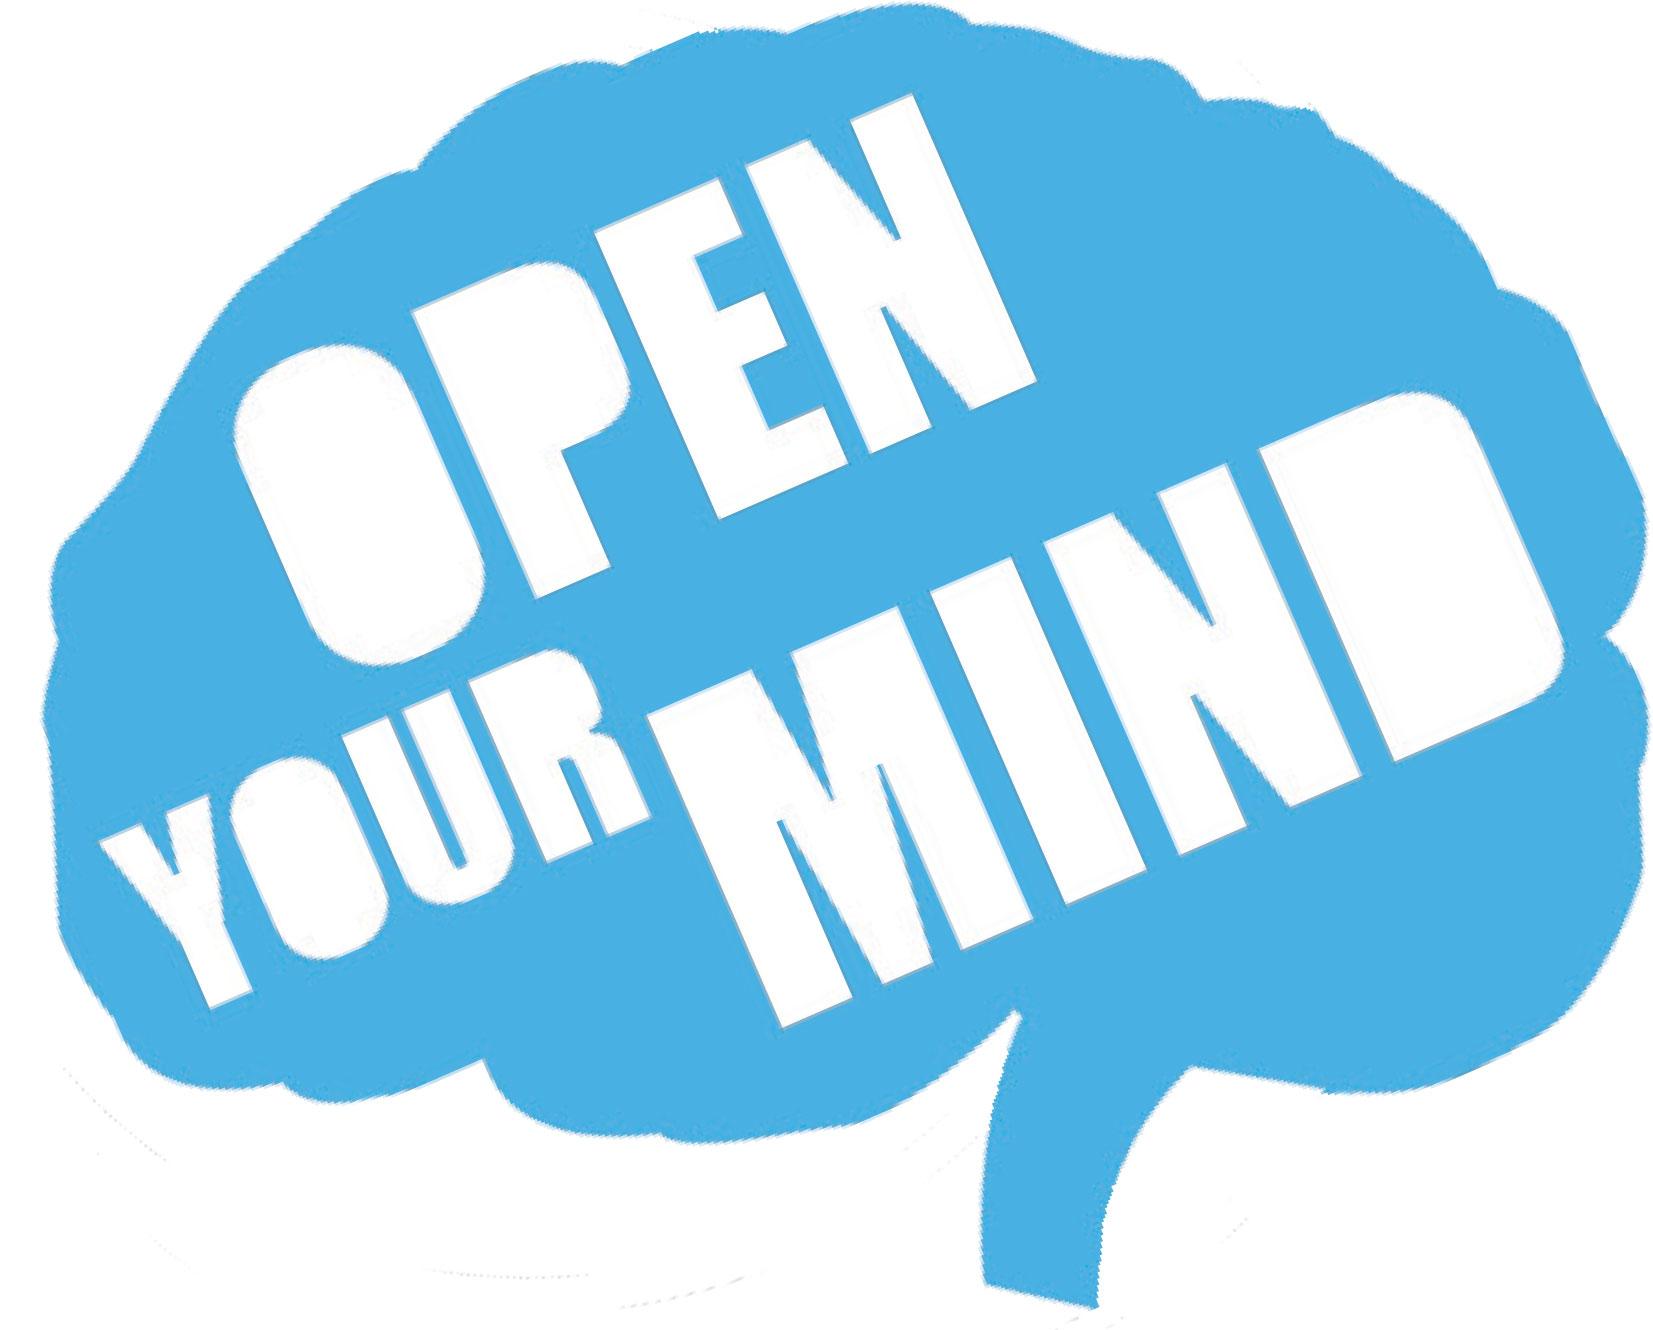 Mind clipart mental health Awareness Magazine Consett Health for